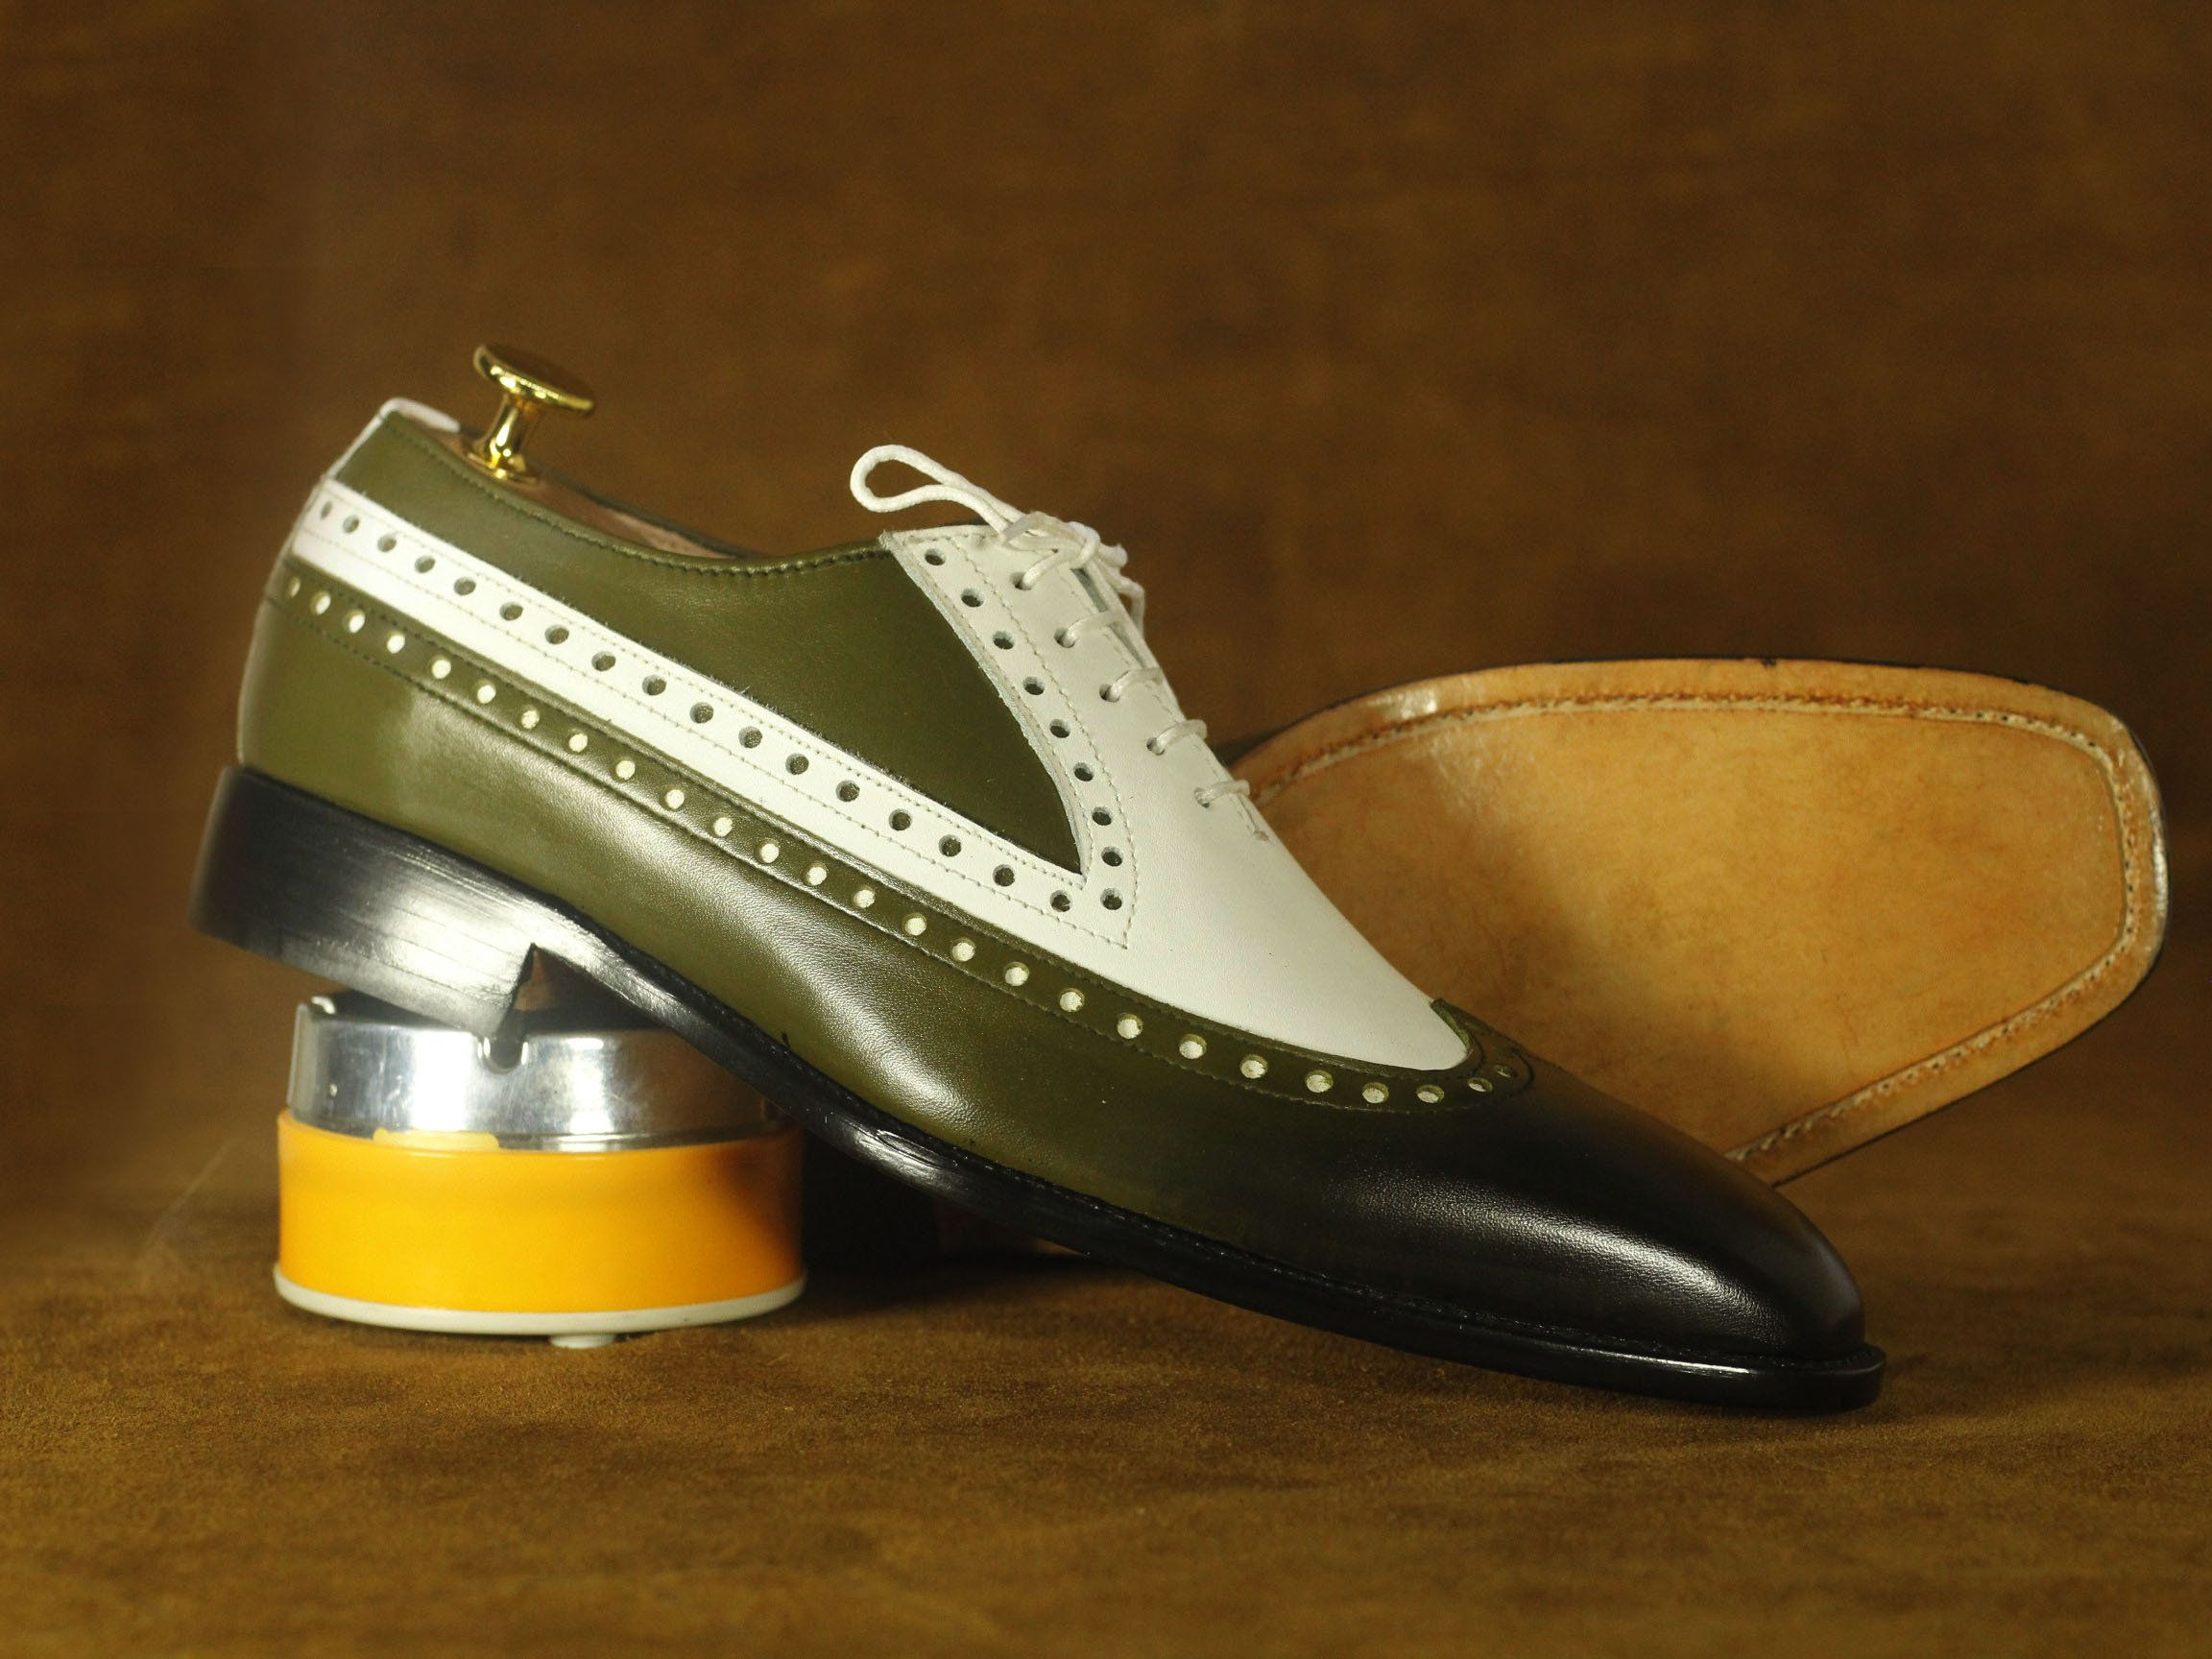 Bespoke Olive Green White Leather Shoes Men Wing Shoes Dress Shoes Made To Order Shoes Dress Form White Leather Shoes Alligator Dress Shoes Dress Shoes Men [ 1728 x 2304 Pixel ]